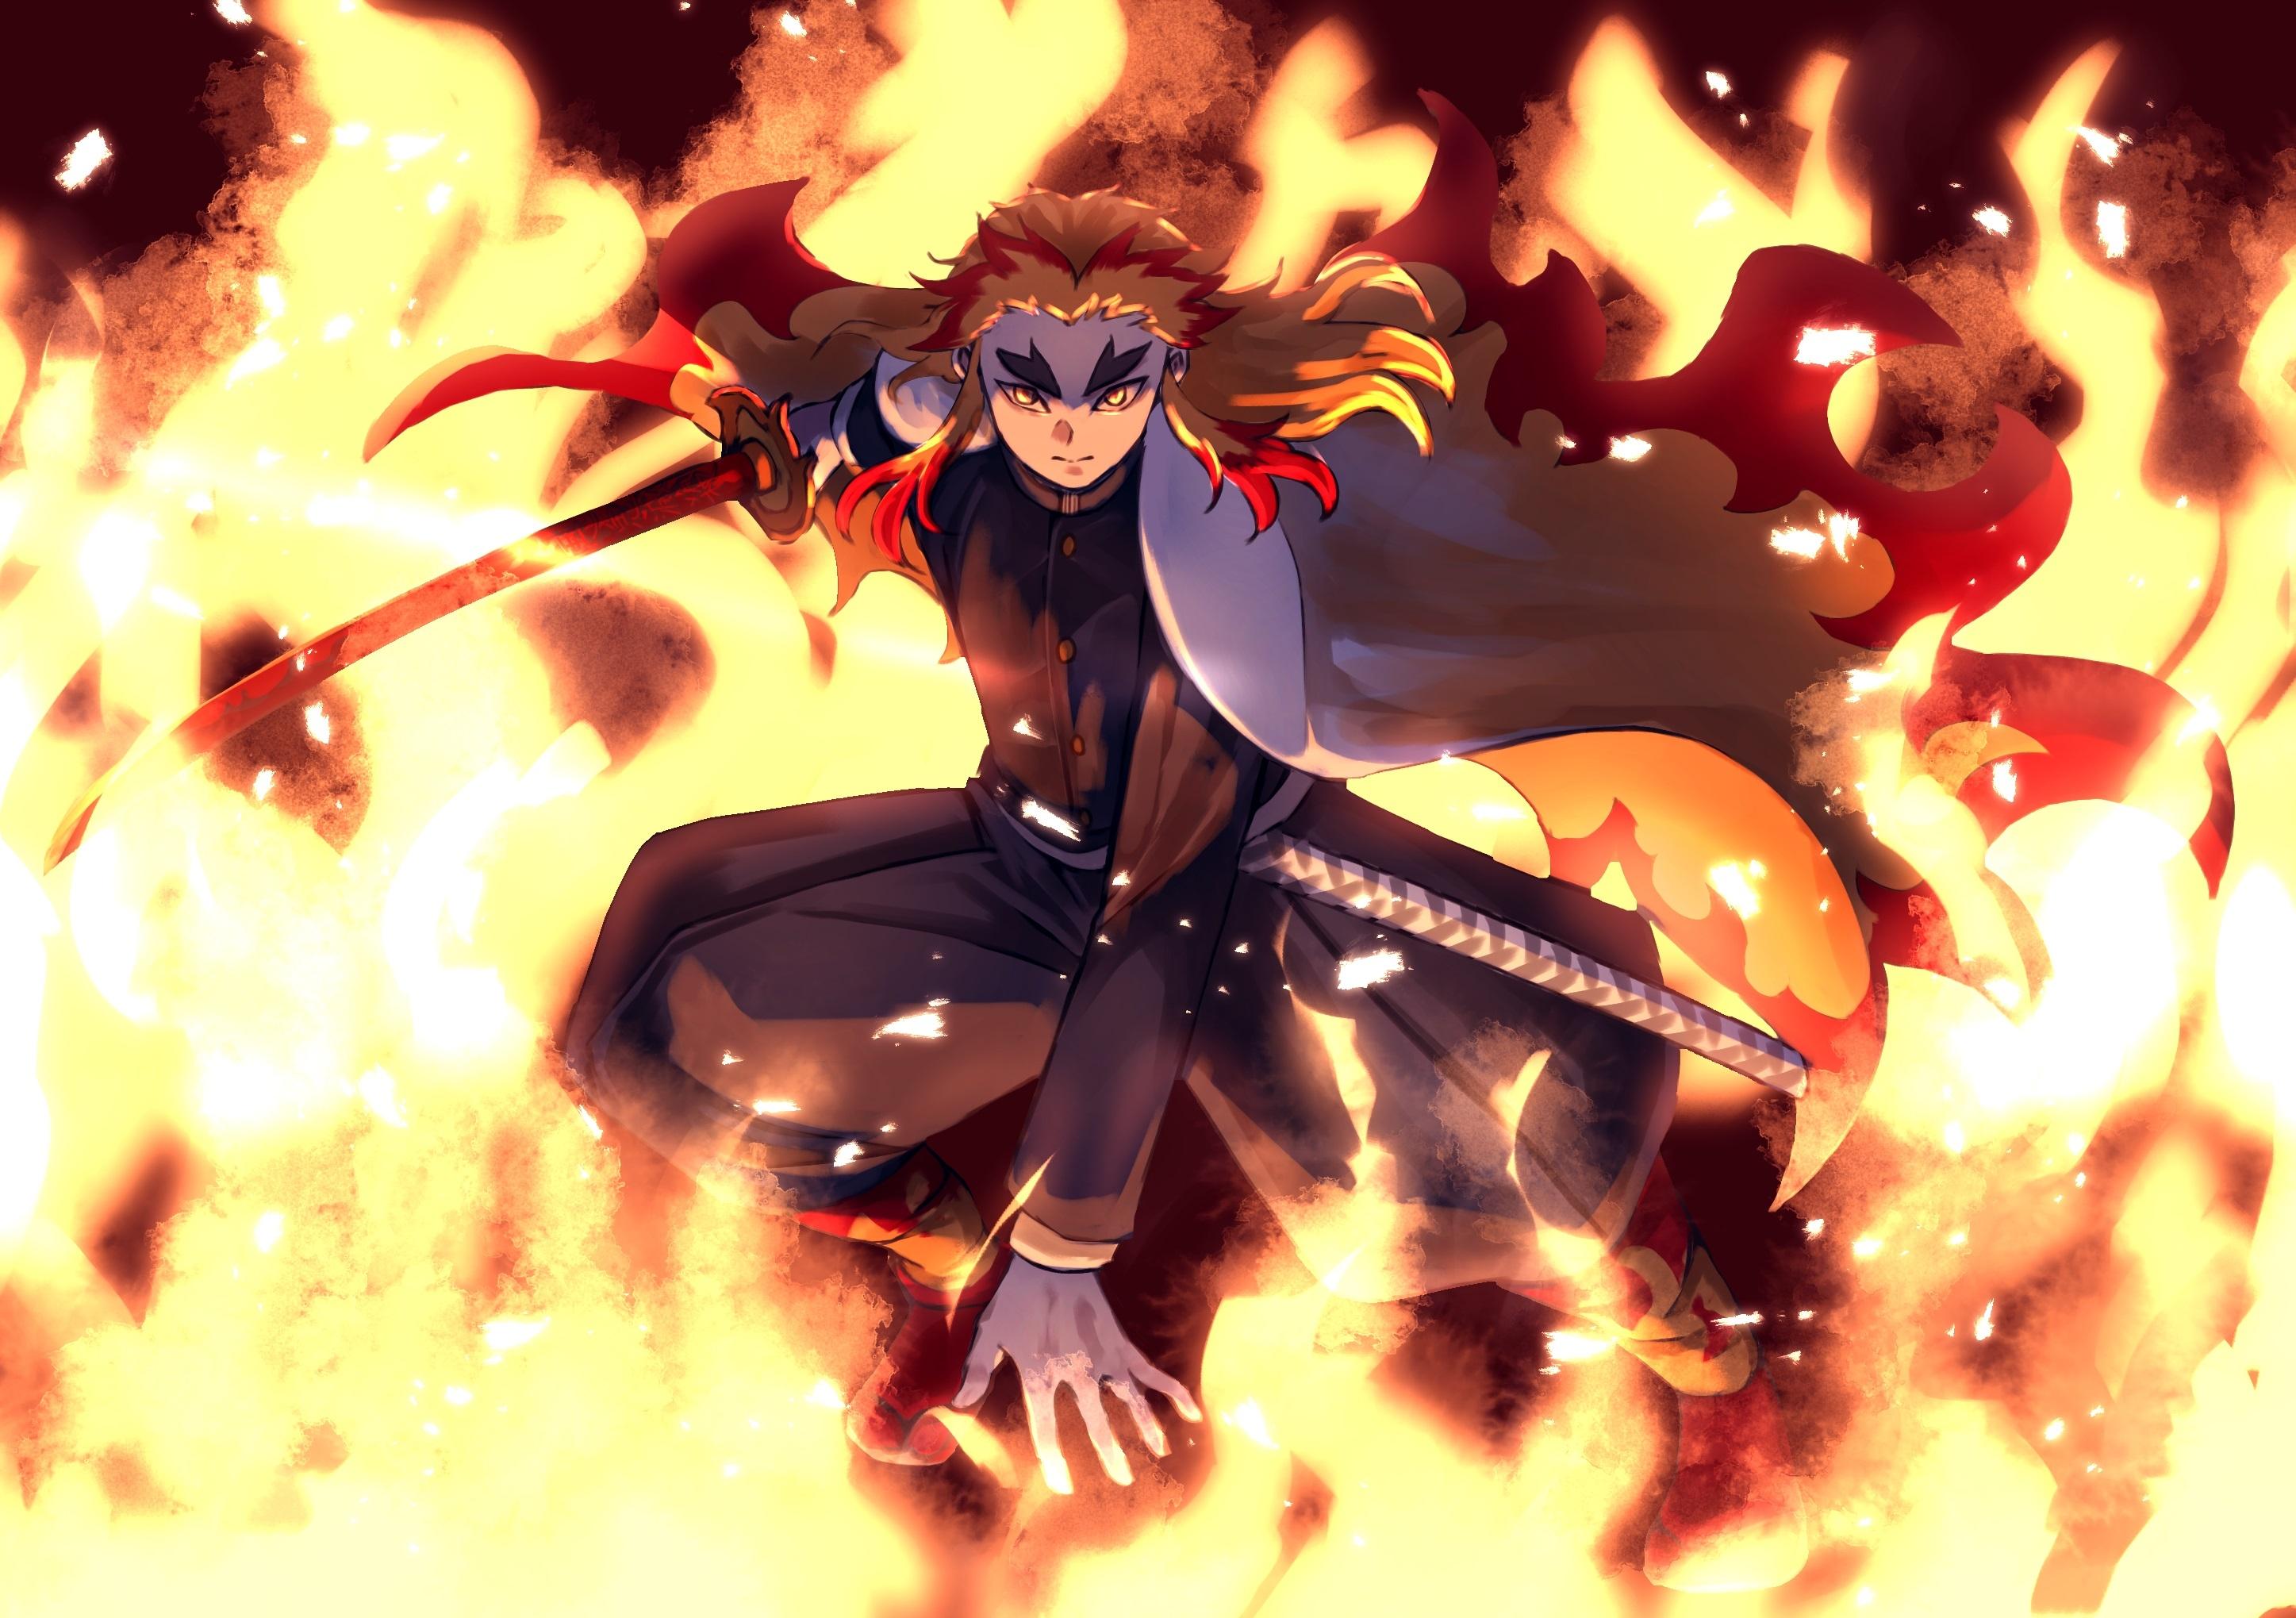 Demon Slayer Anime Wallpaper Laptop - Anime Wallpaper HD